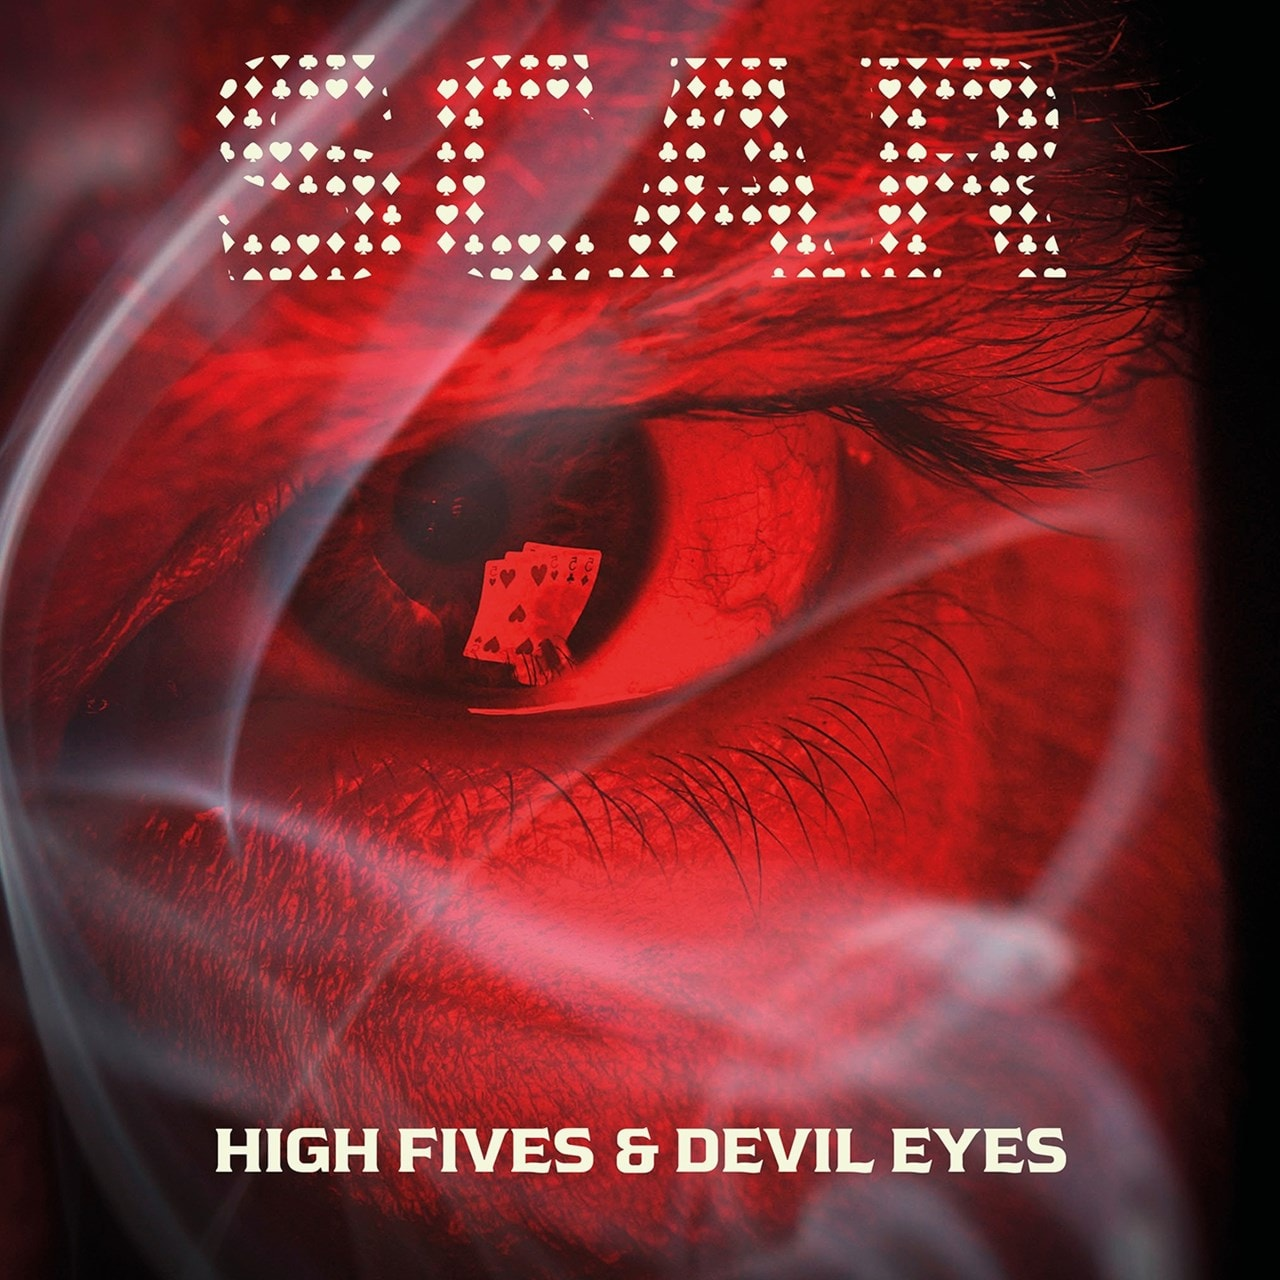 High Fives & Devil Eyes - 1